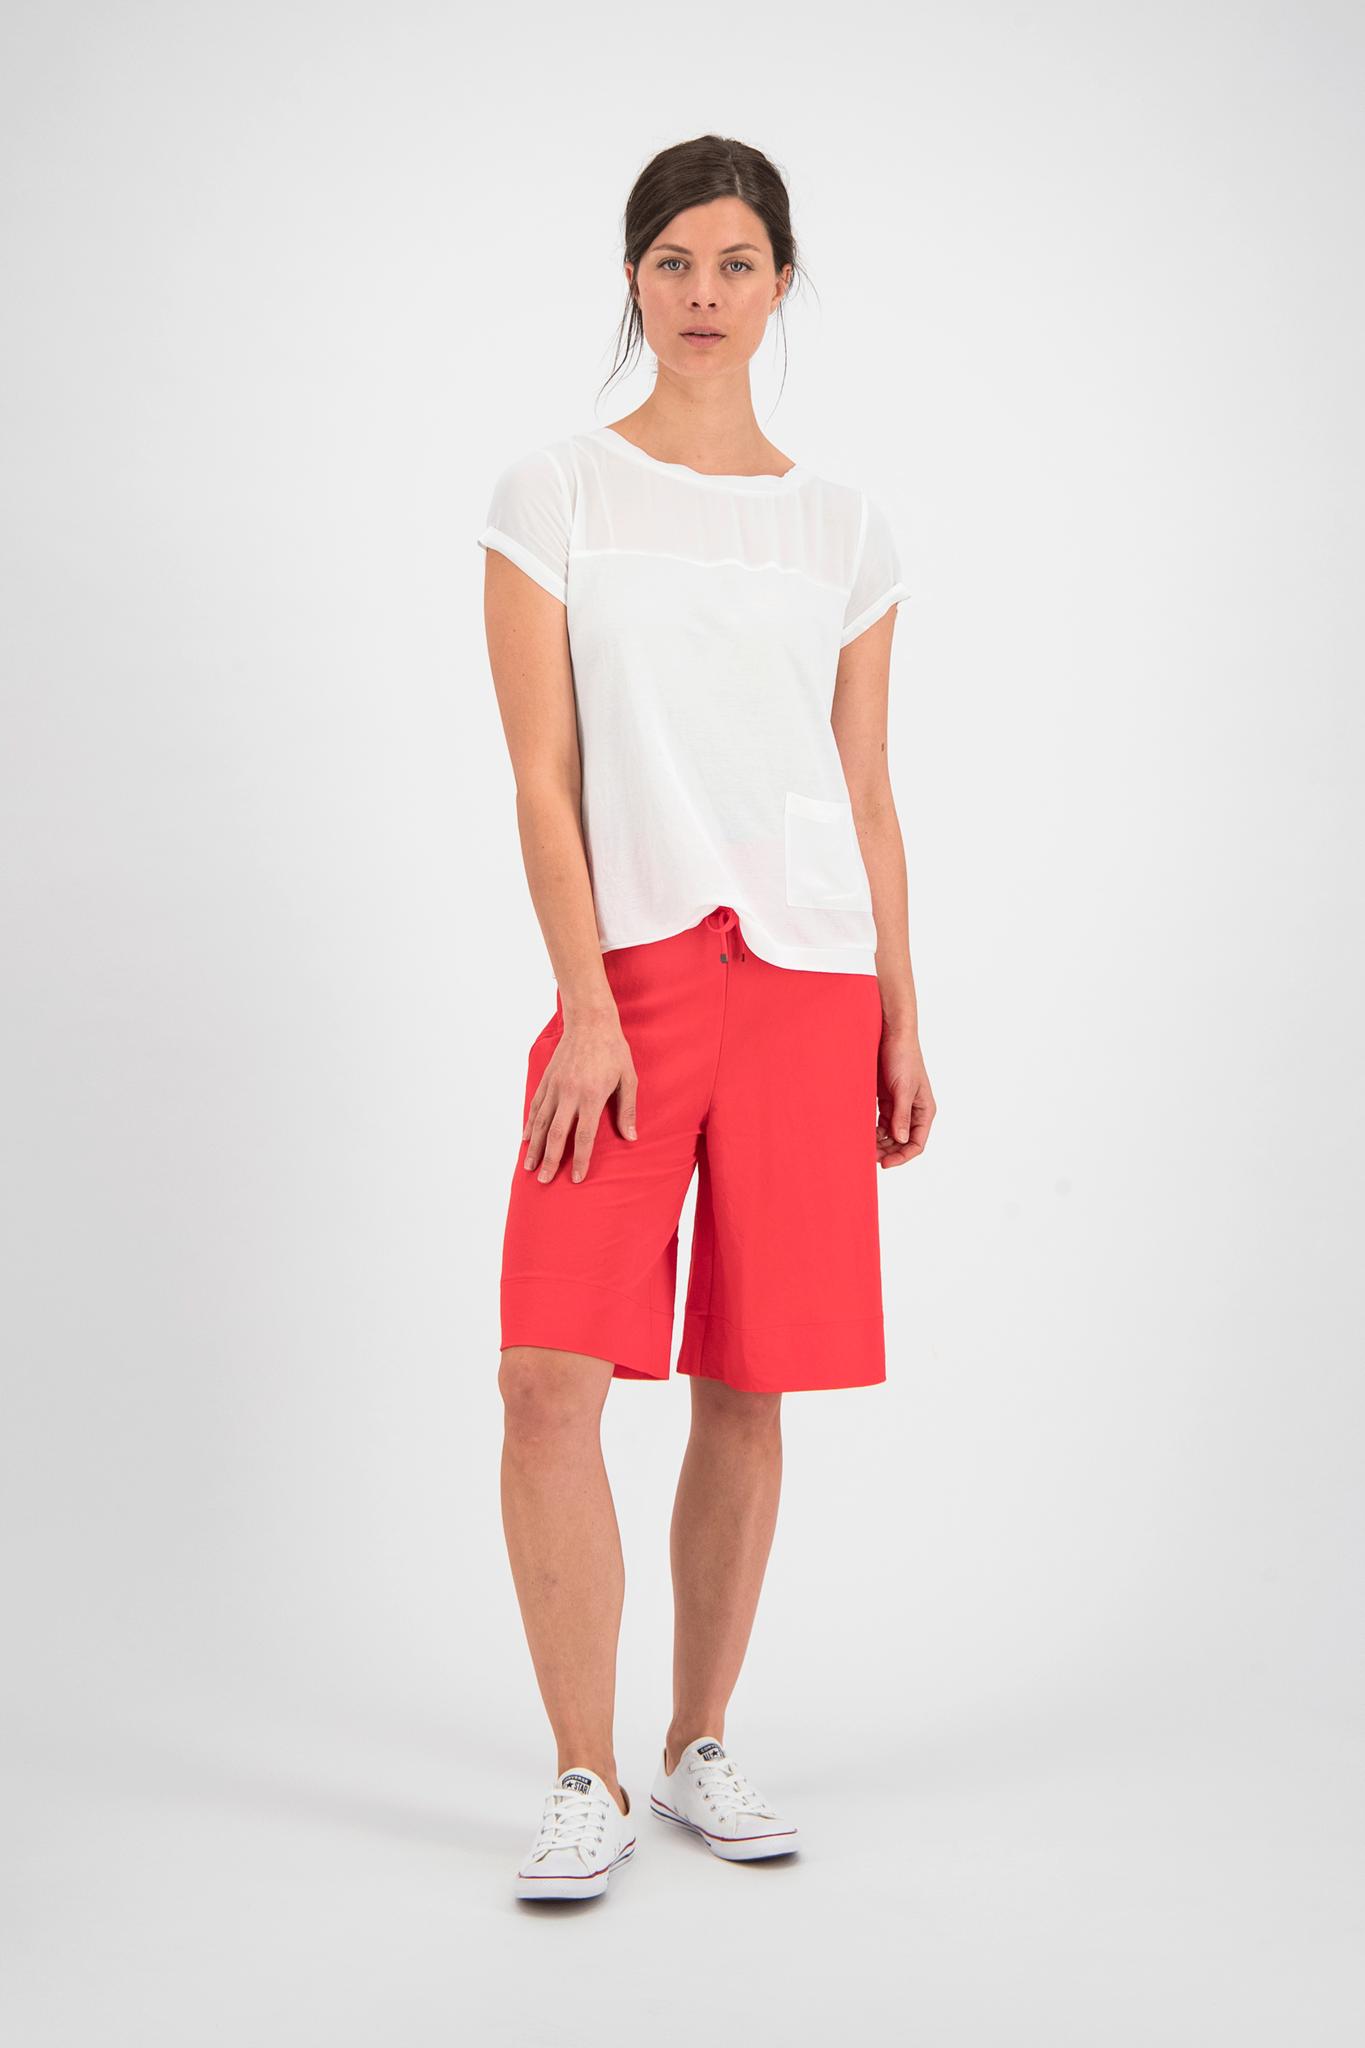 SYLVER Crêpe Stretch Skirt-Short - Coral